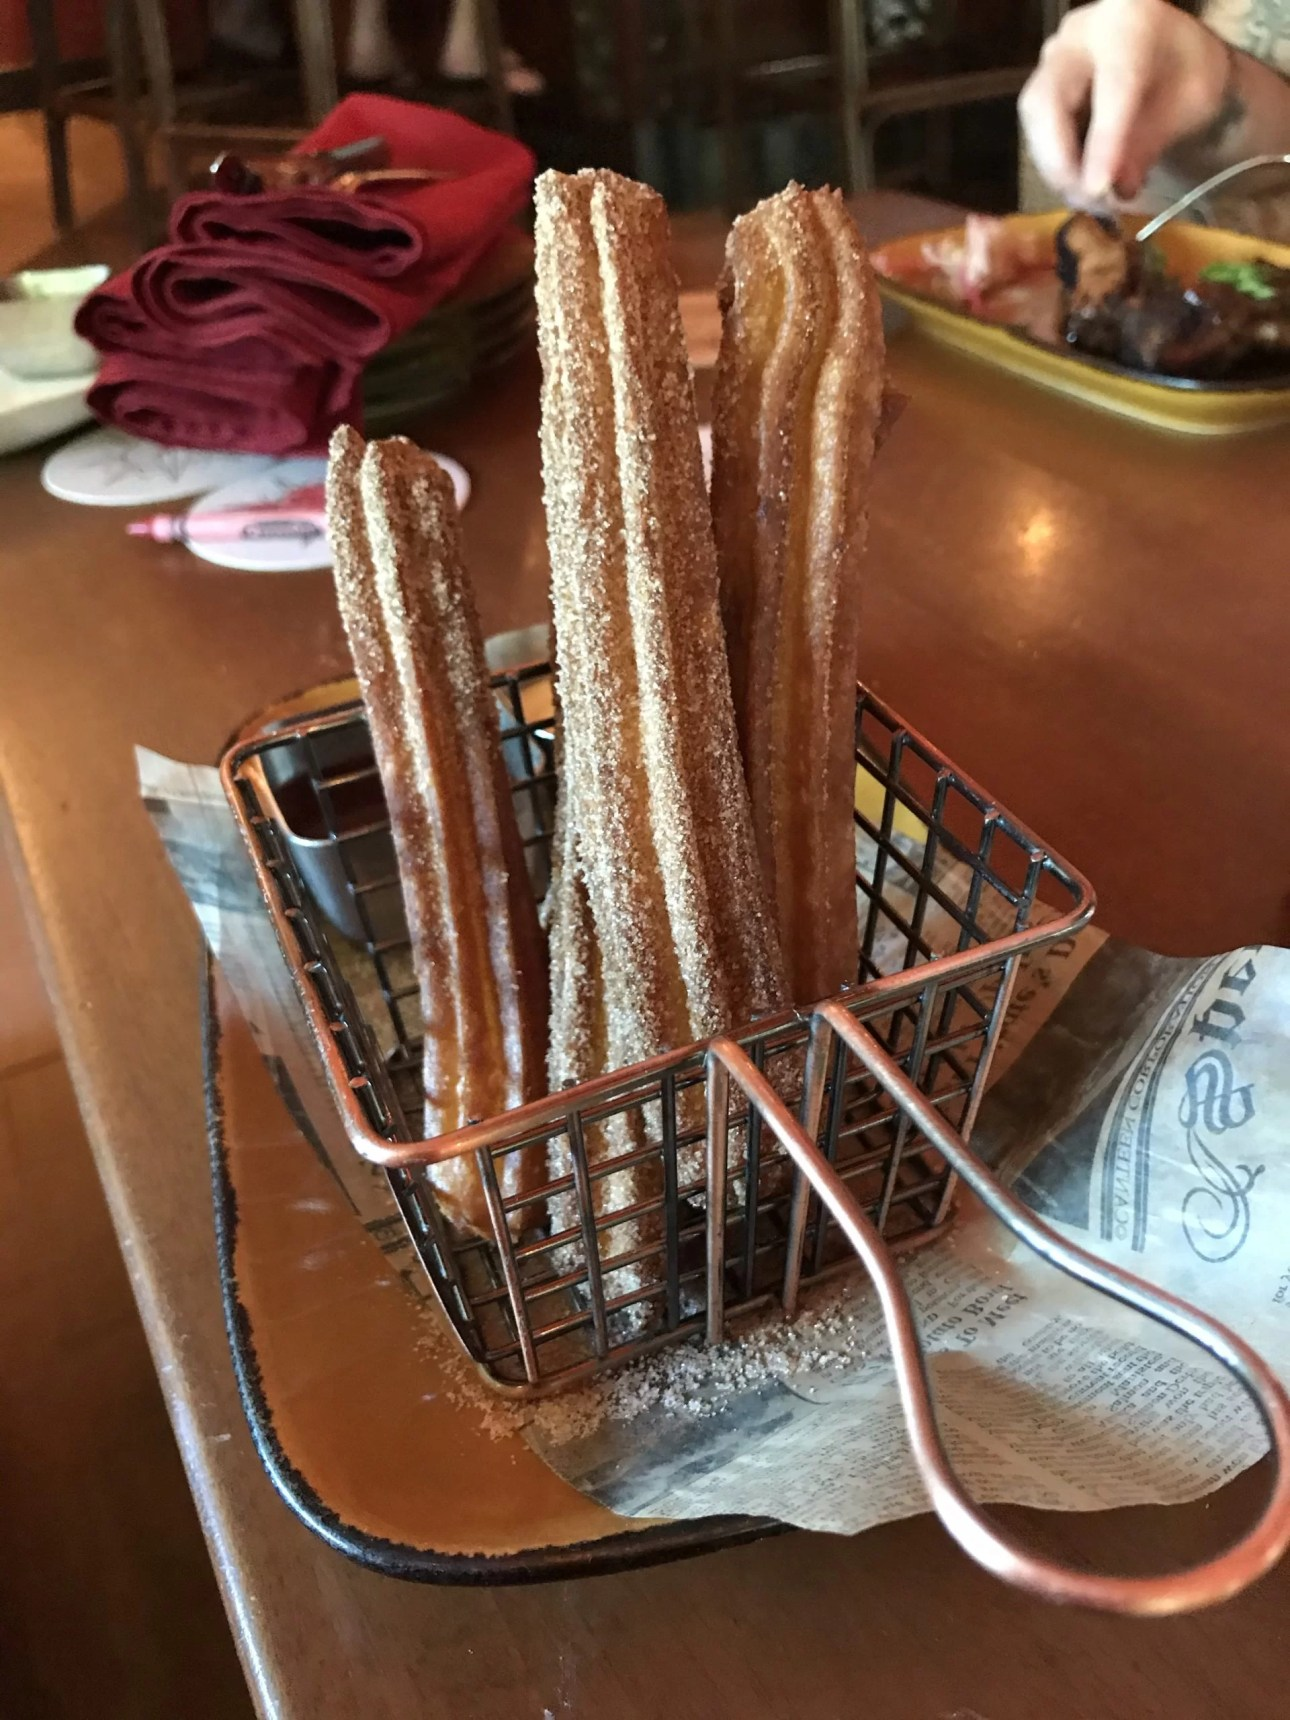 gluten-free churros at Nomad Lounge